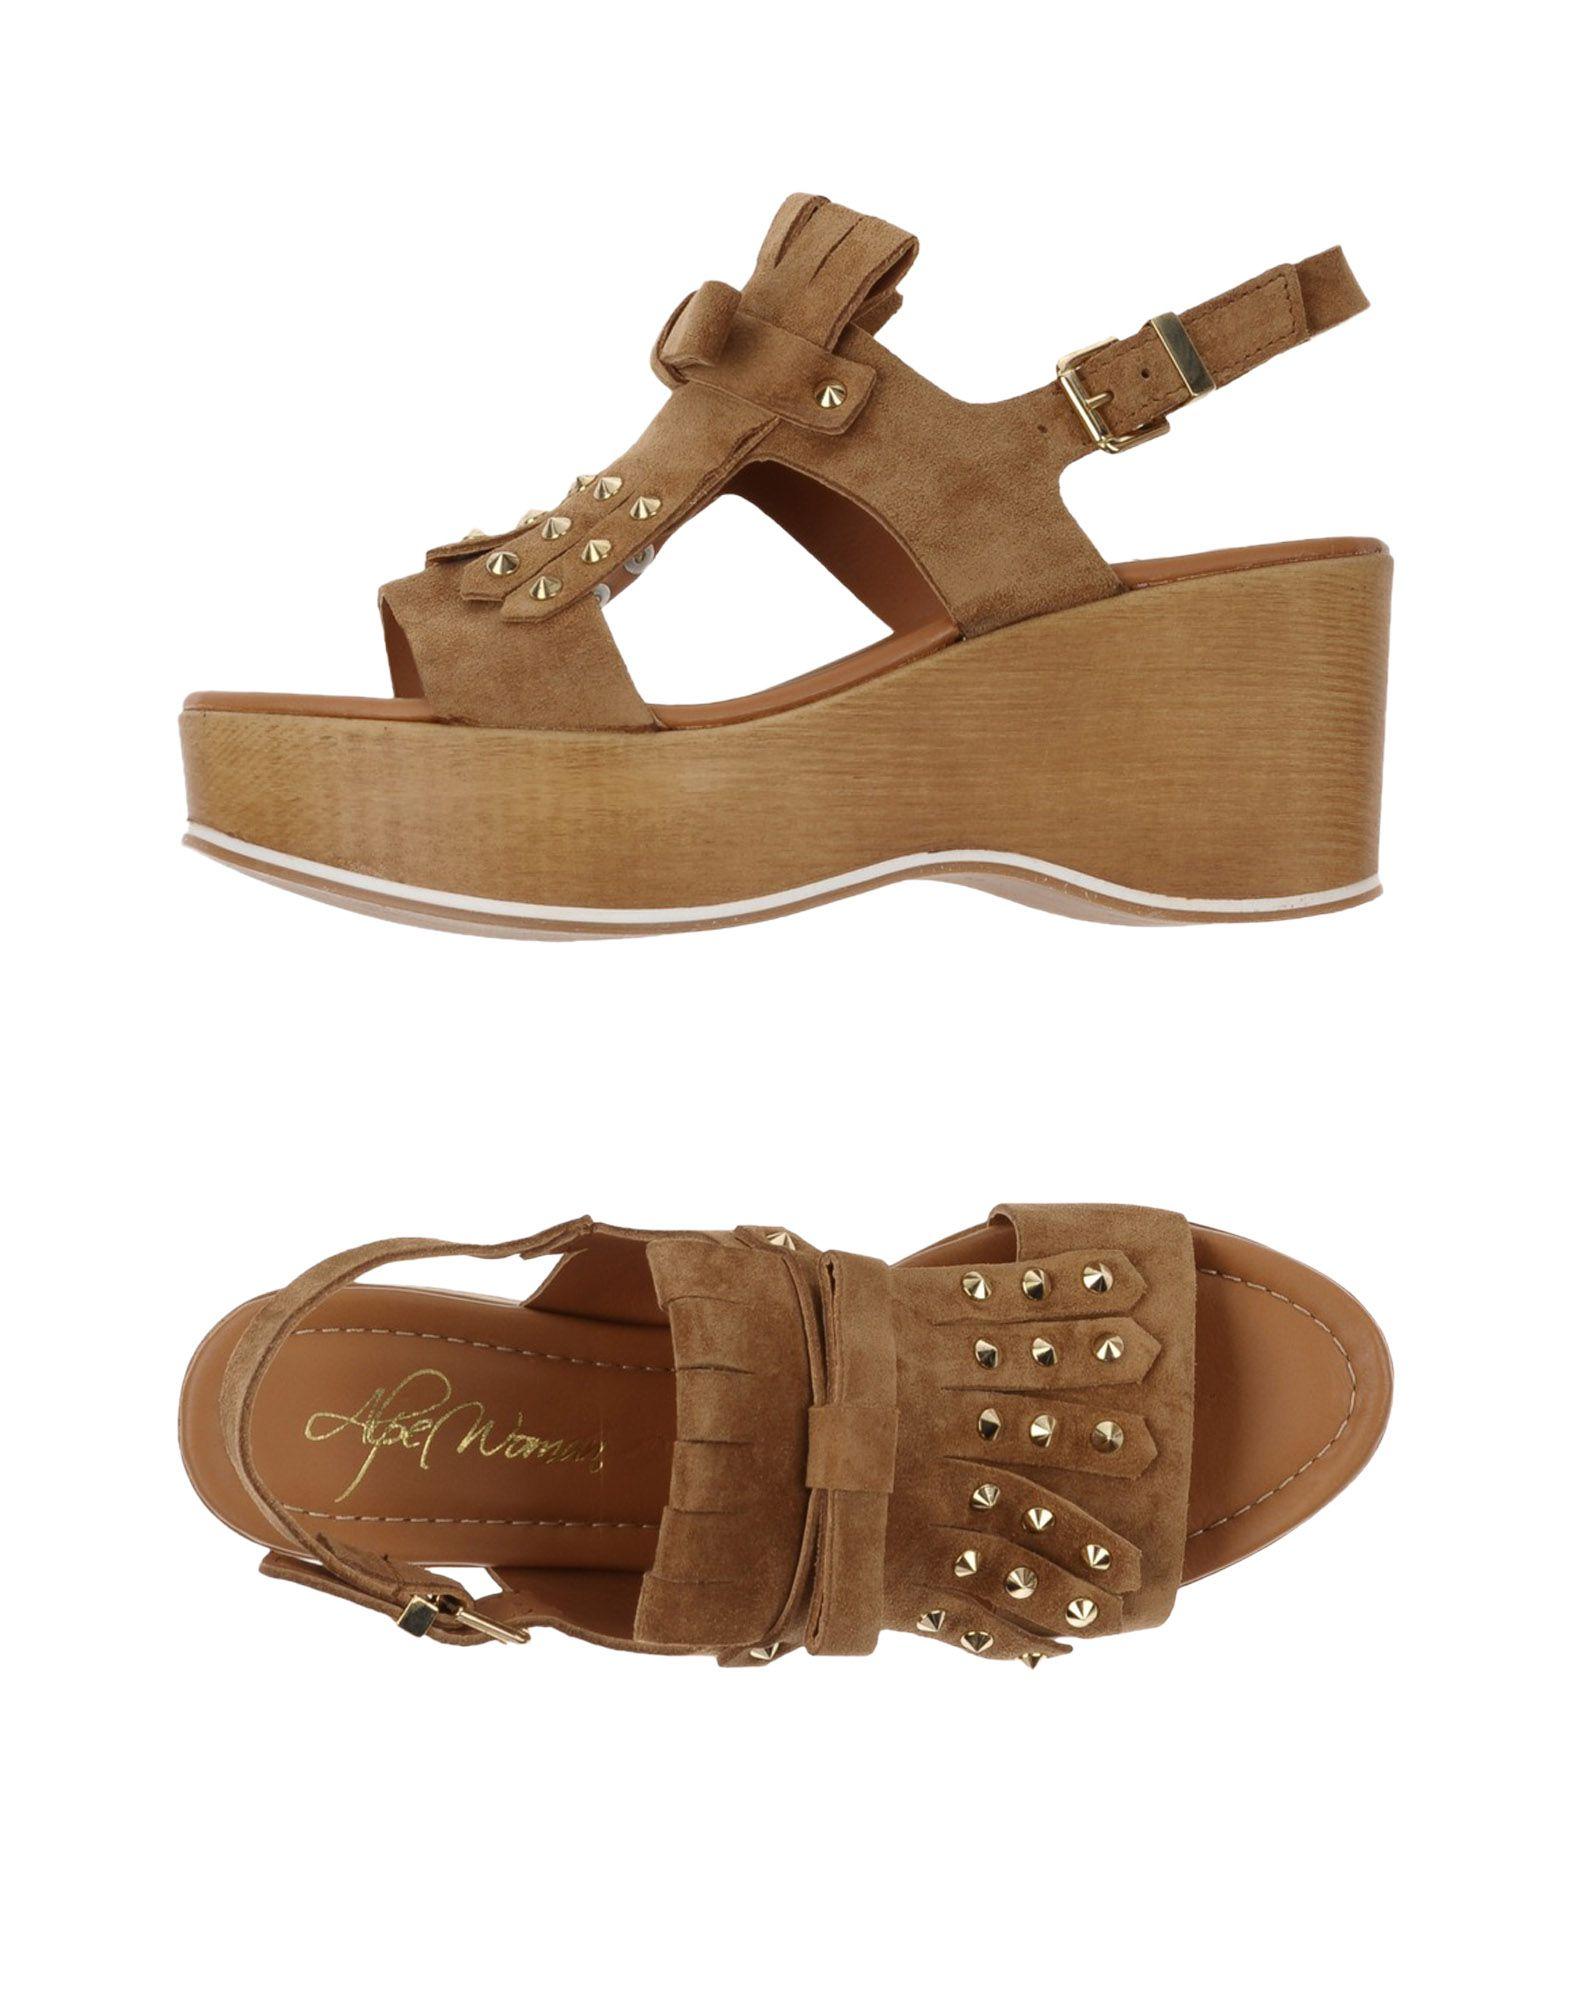 ALPE WOMAN SHOES Сандалии beyarne women shoes fashion pointed toe slip on flat shoes woman comfortable single casual flats spring autumn size 35 41 zapato